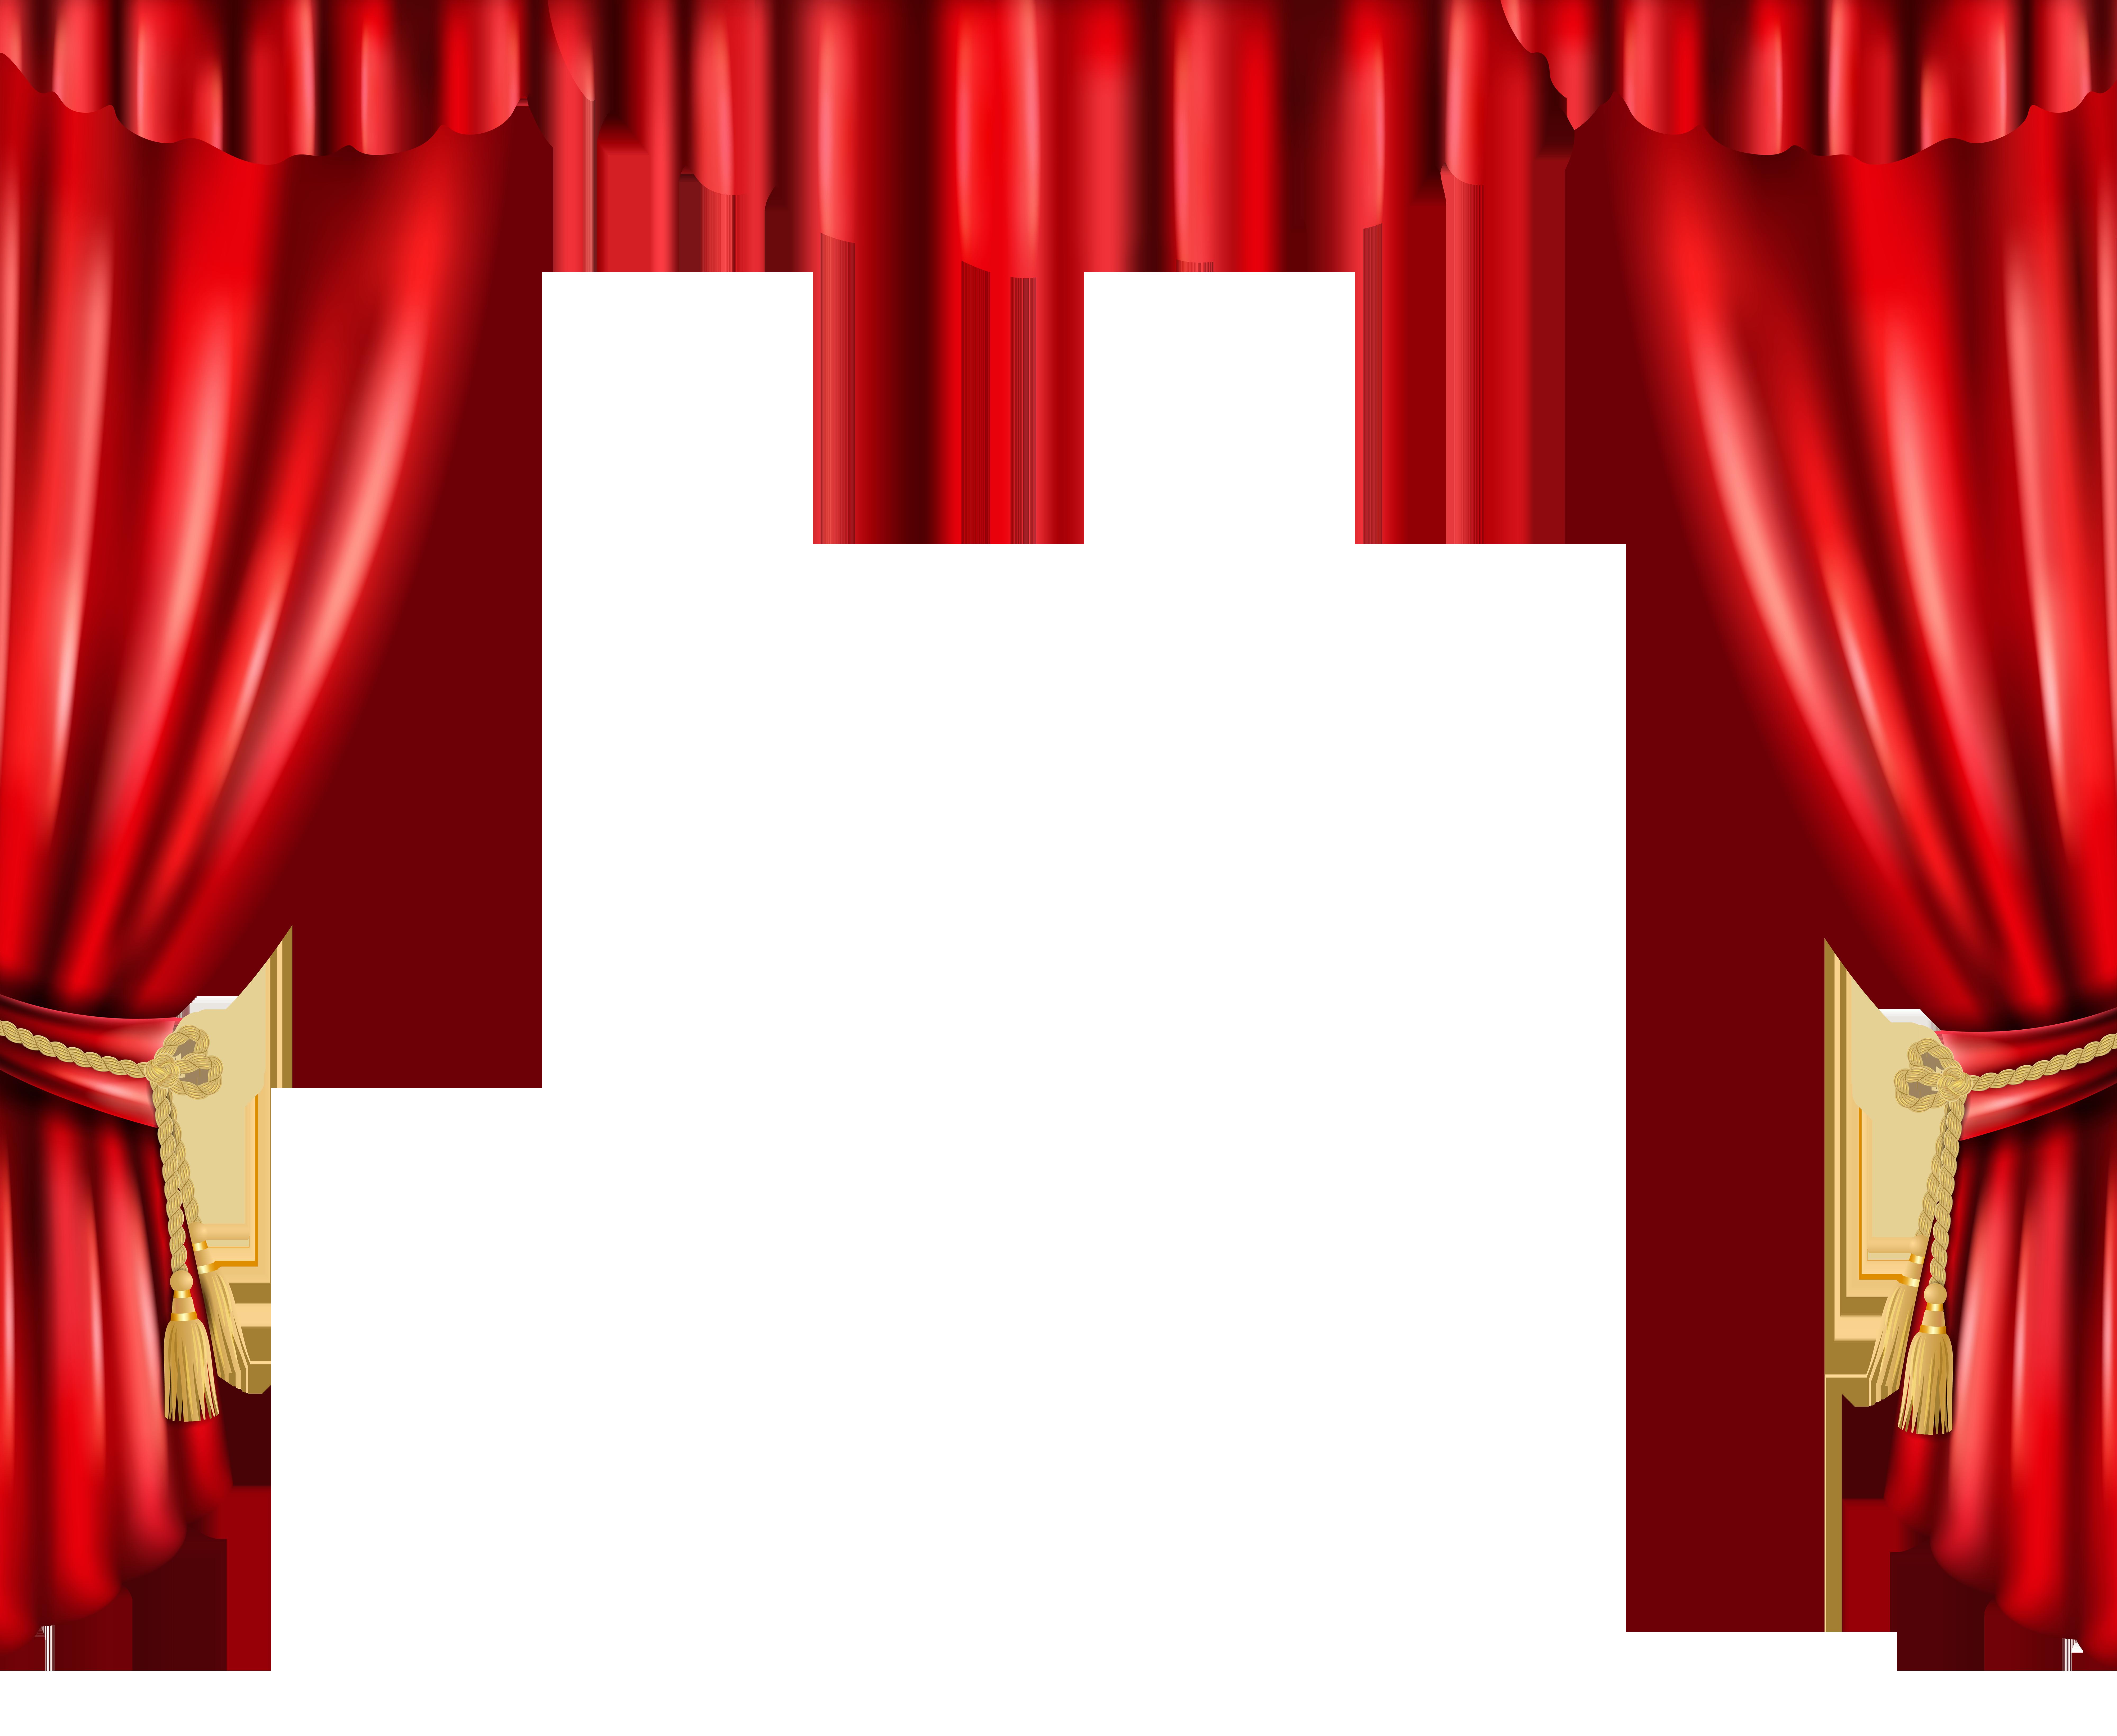 Png transparent clip art. Furniture clipart bedroom curtain